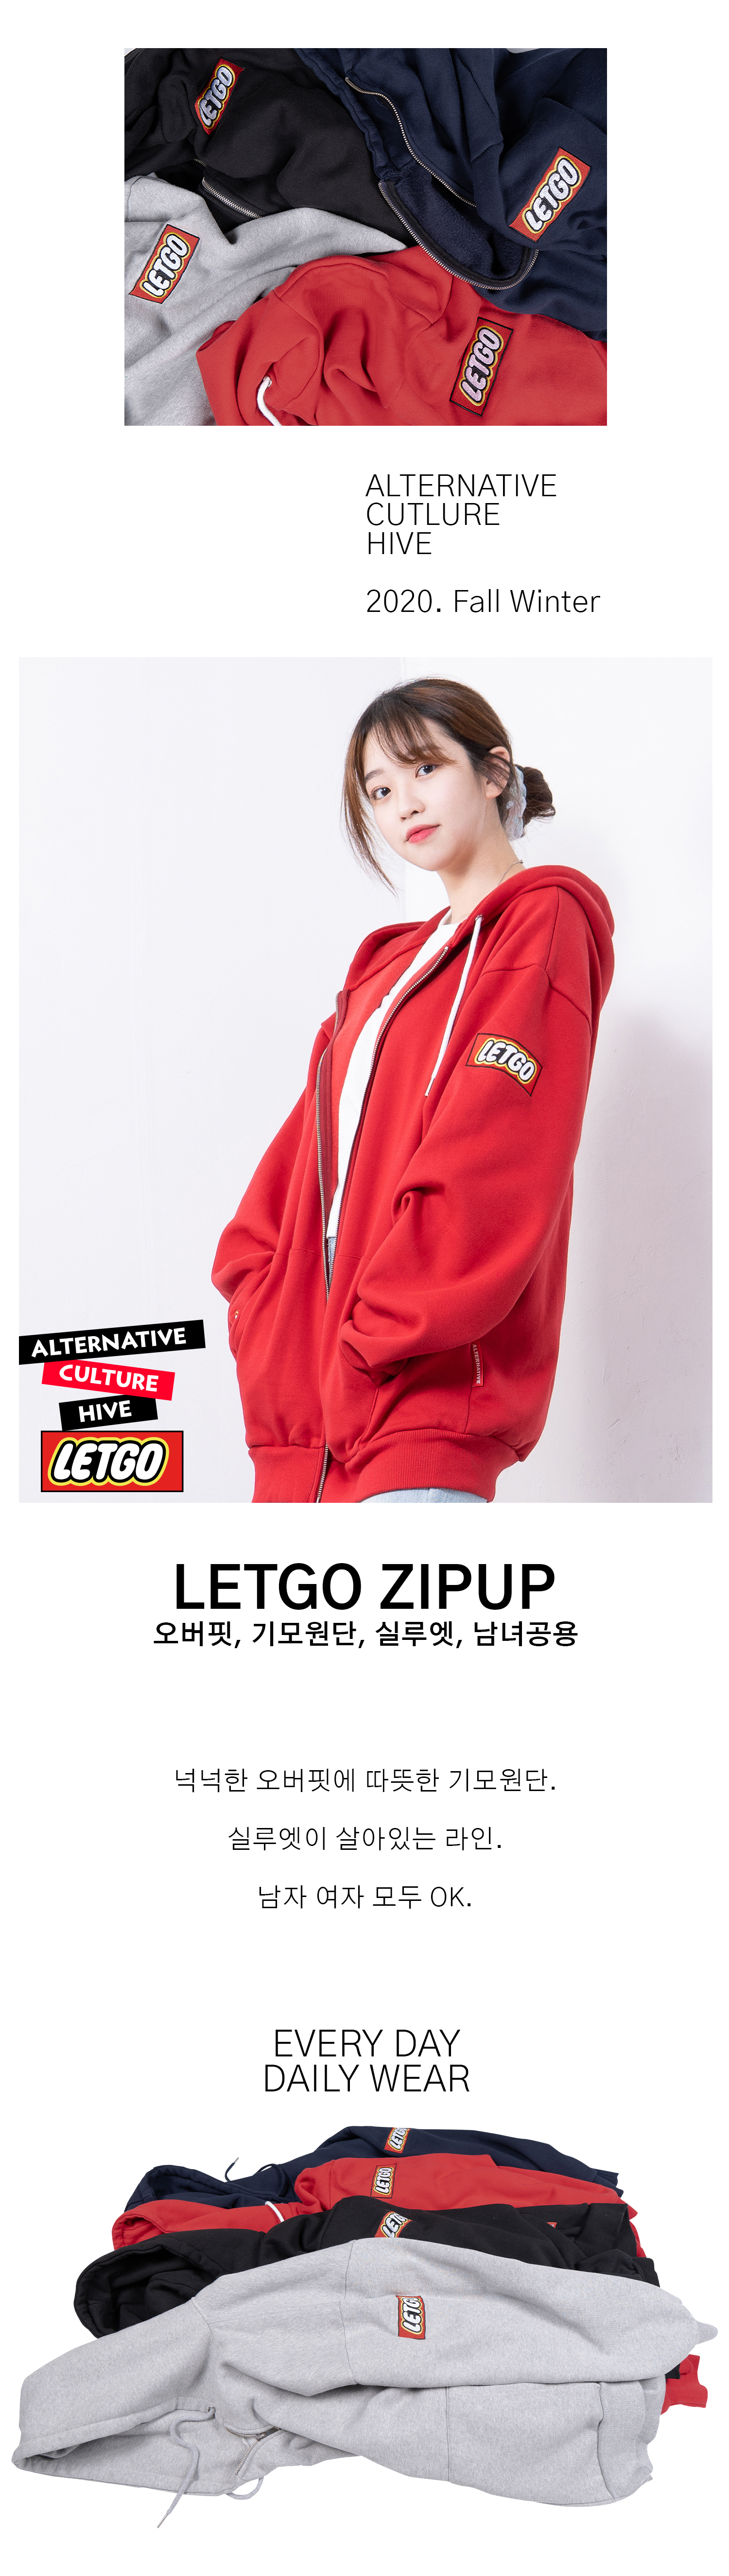 01Letgo_zipup_RD_top.jpg